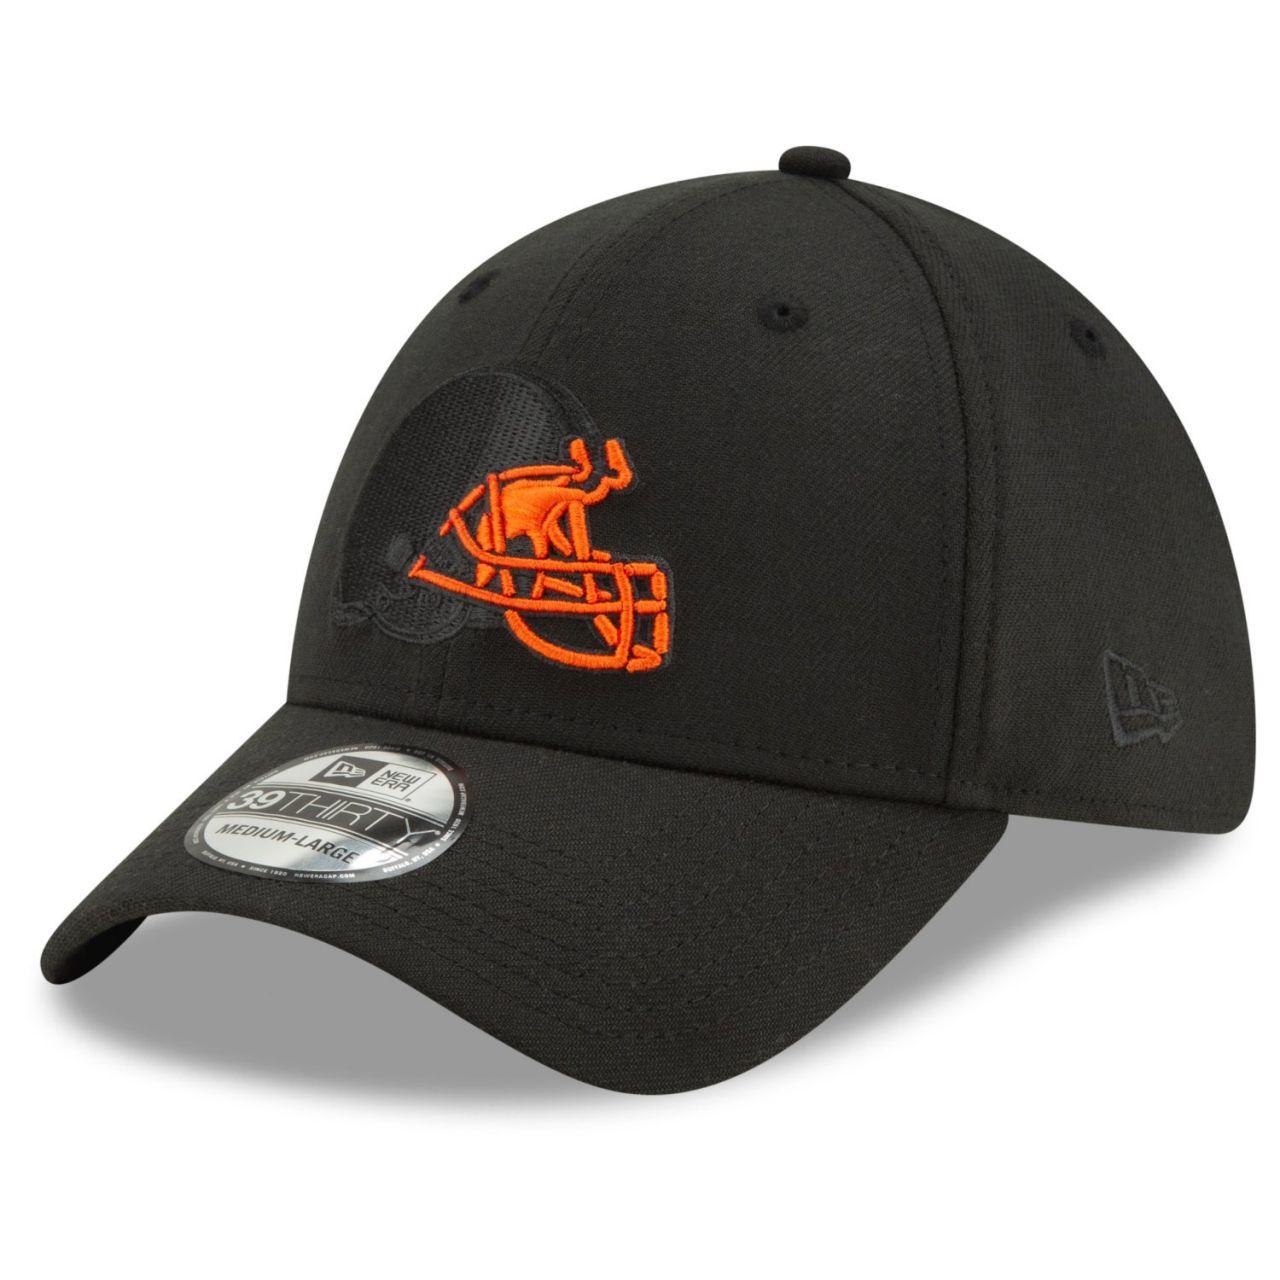 amfoo - New Era 39Thirty Stretch Cap - ELEMENTS Cleveland Browns